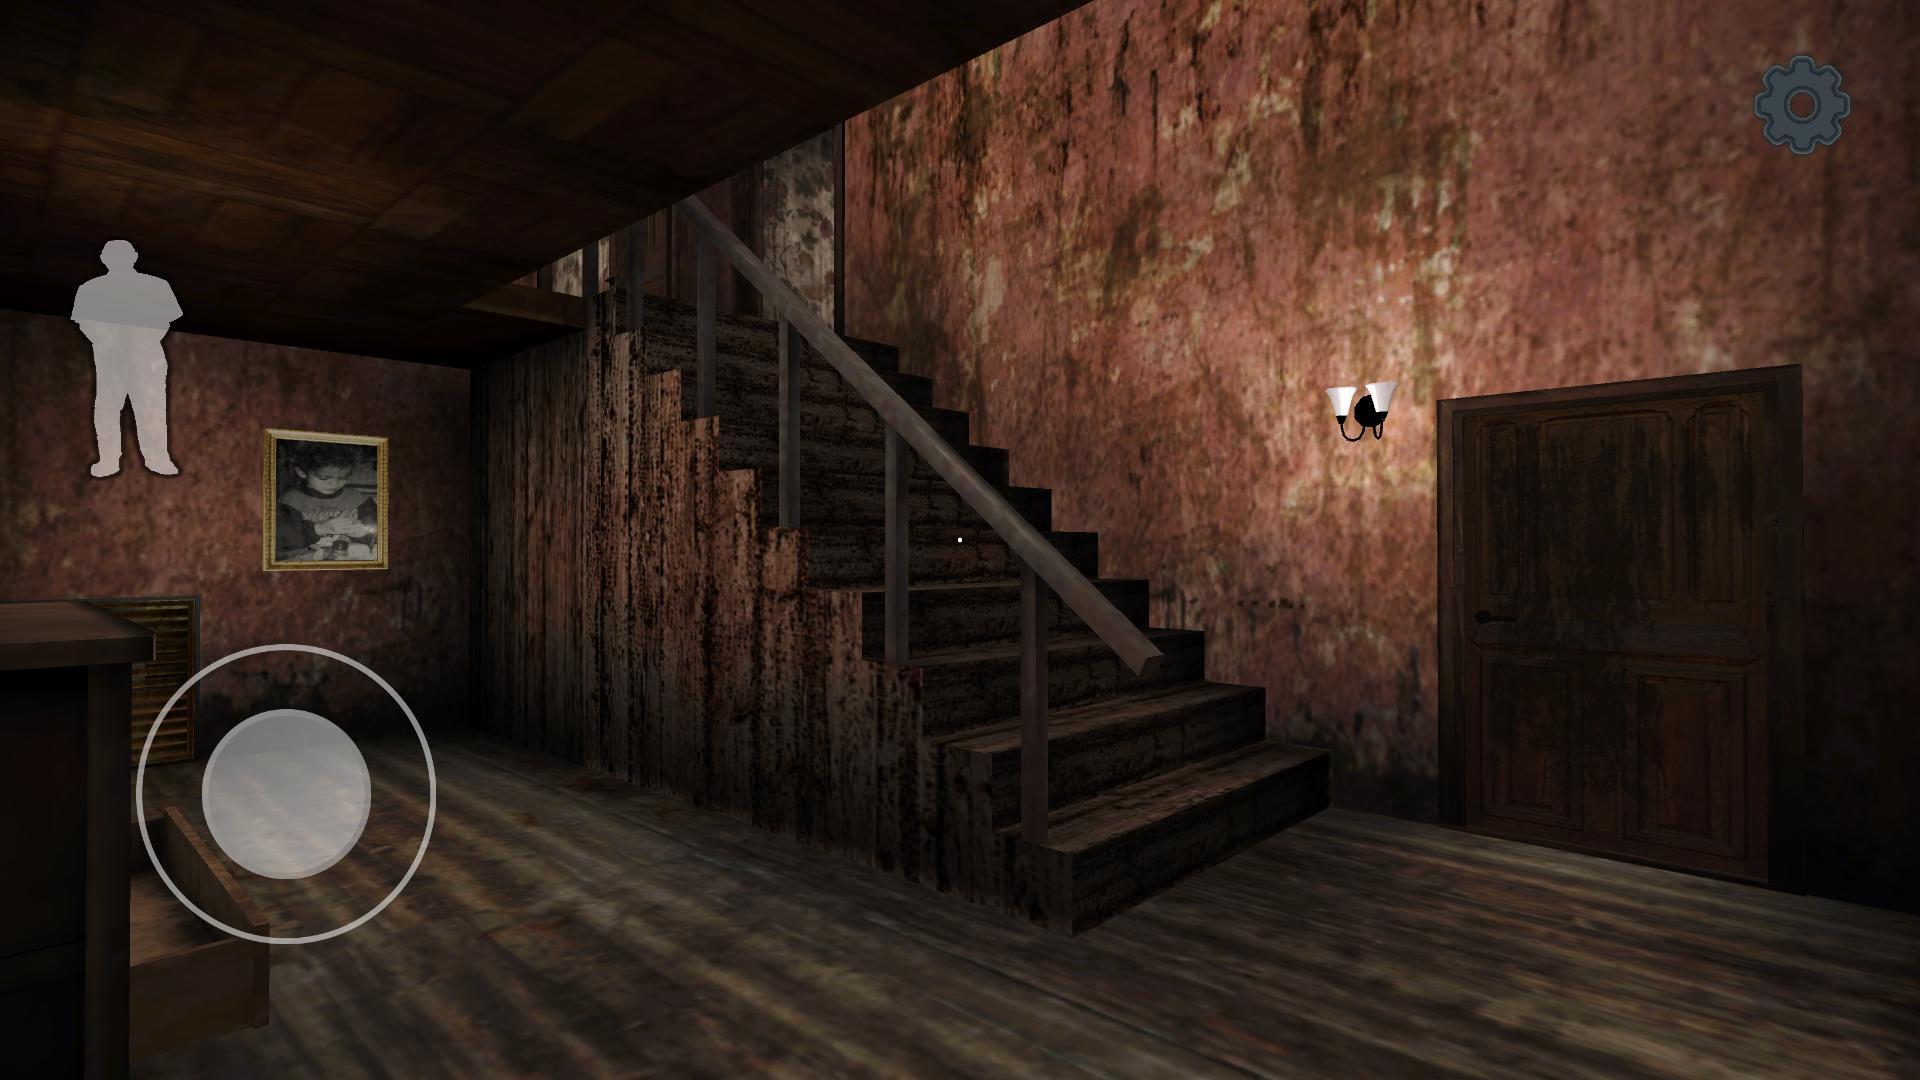 Evil Kid The Horror Game 1.1.9.5.4.4 Screenshot 5